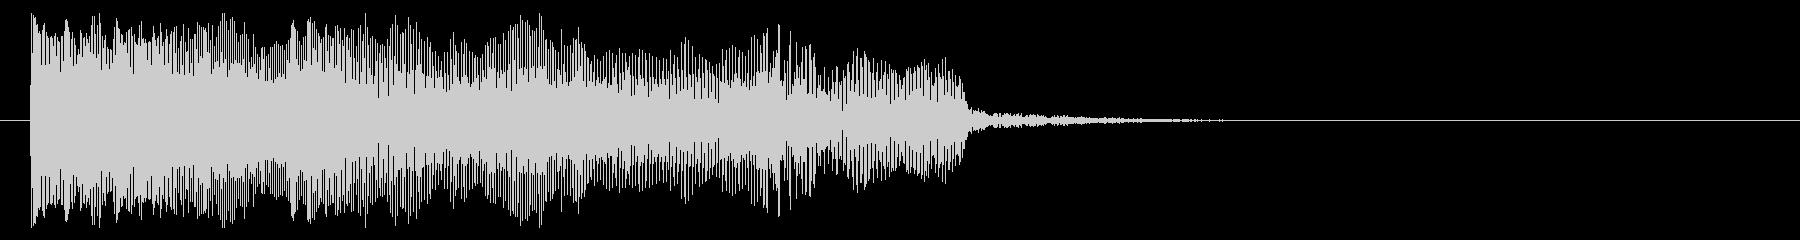 8bitパワーdown-01-1_revの未再生の波形